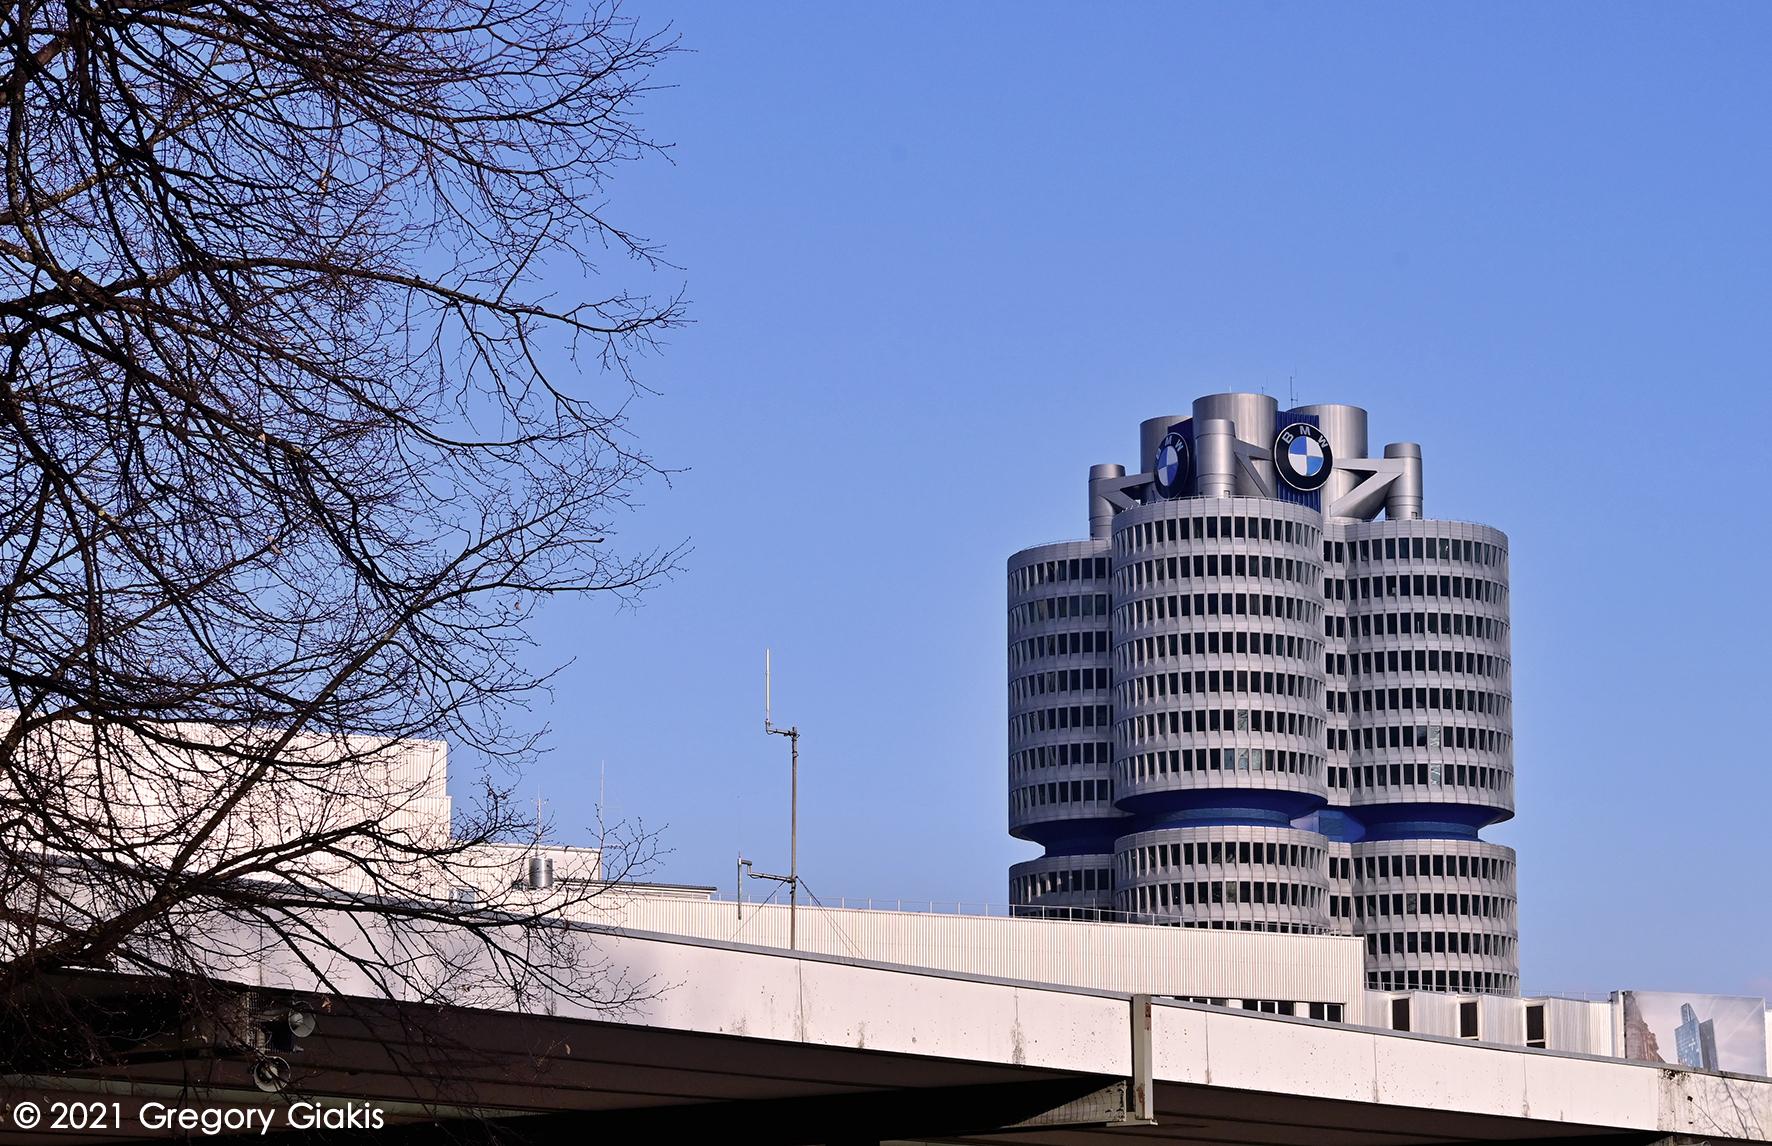 H BMW φωτίστηκε λίγες ώρες πριν την IAA